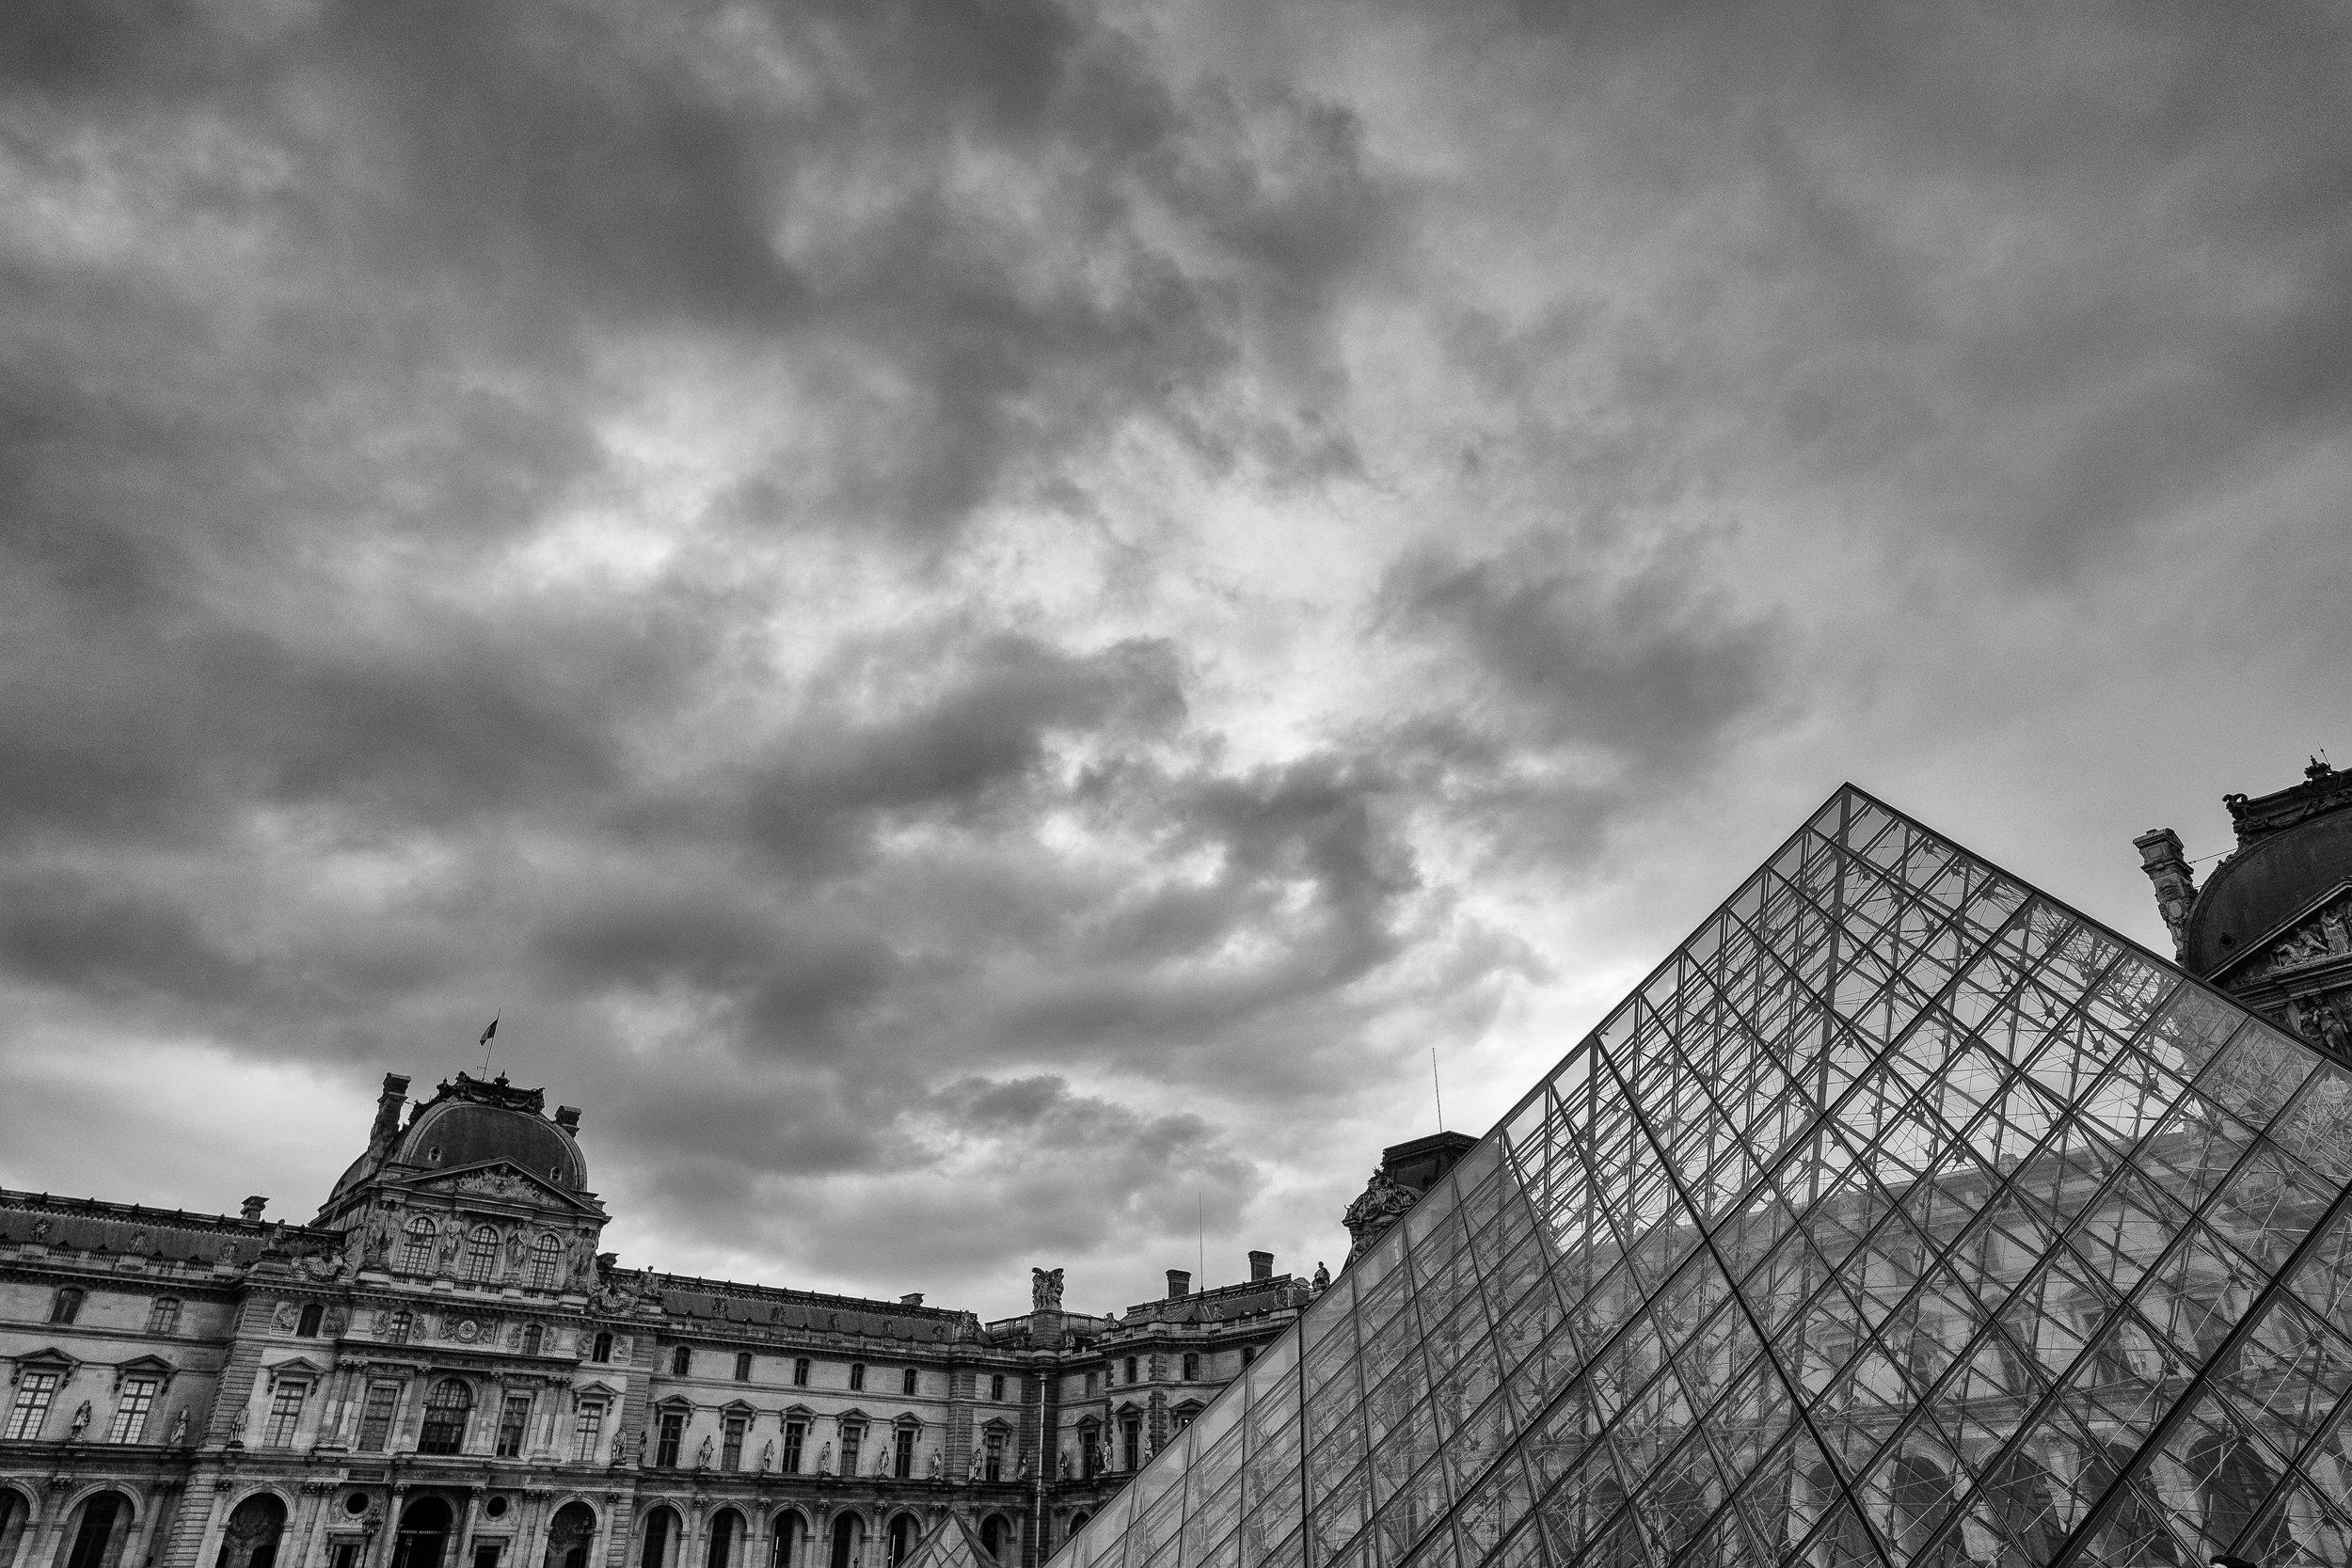 The Louvre. Paris. January, 2017